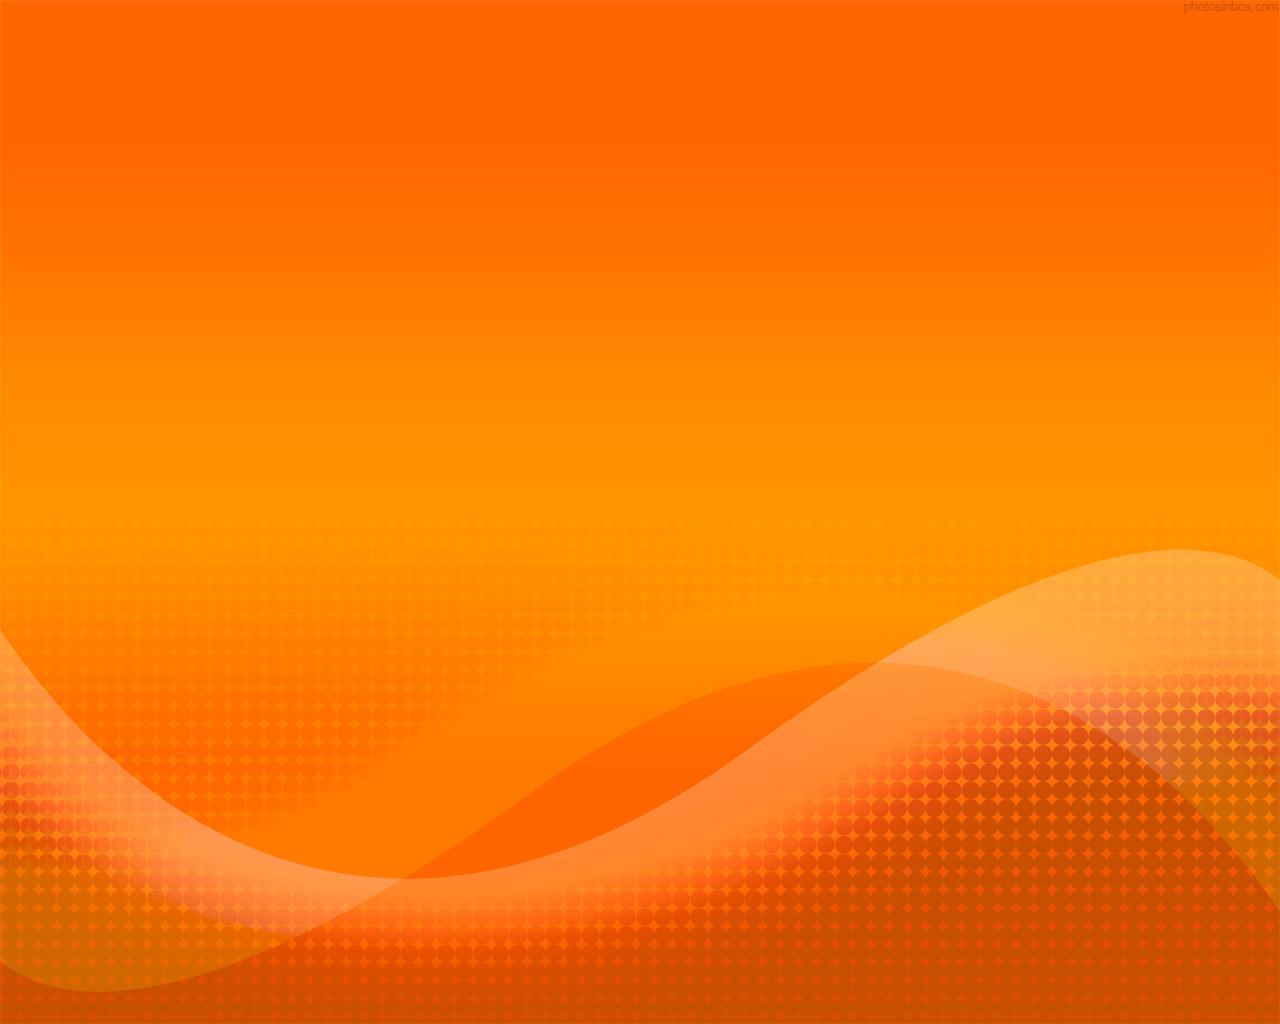 Enlarge Background 1280x1024px Abstract orange halftone background 1280x1024